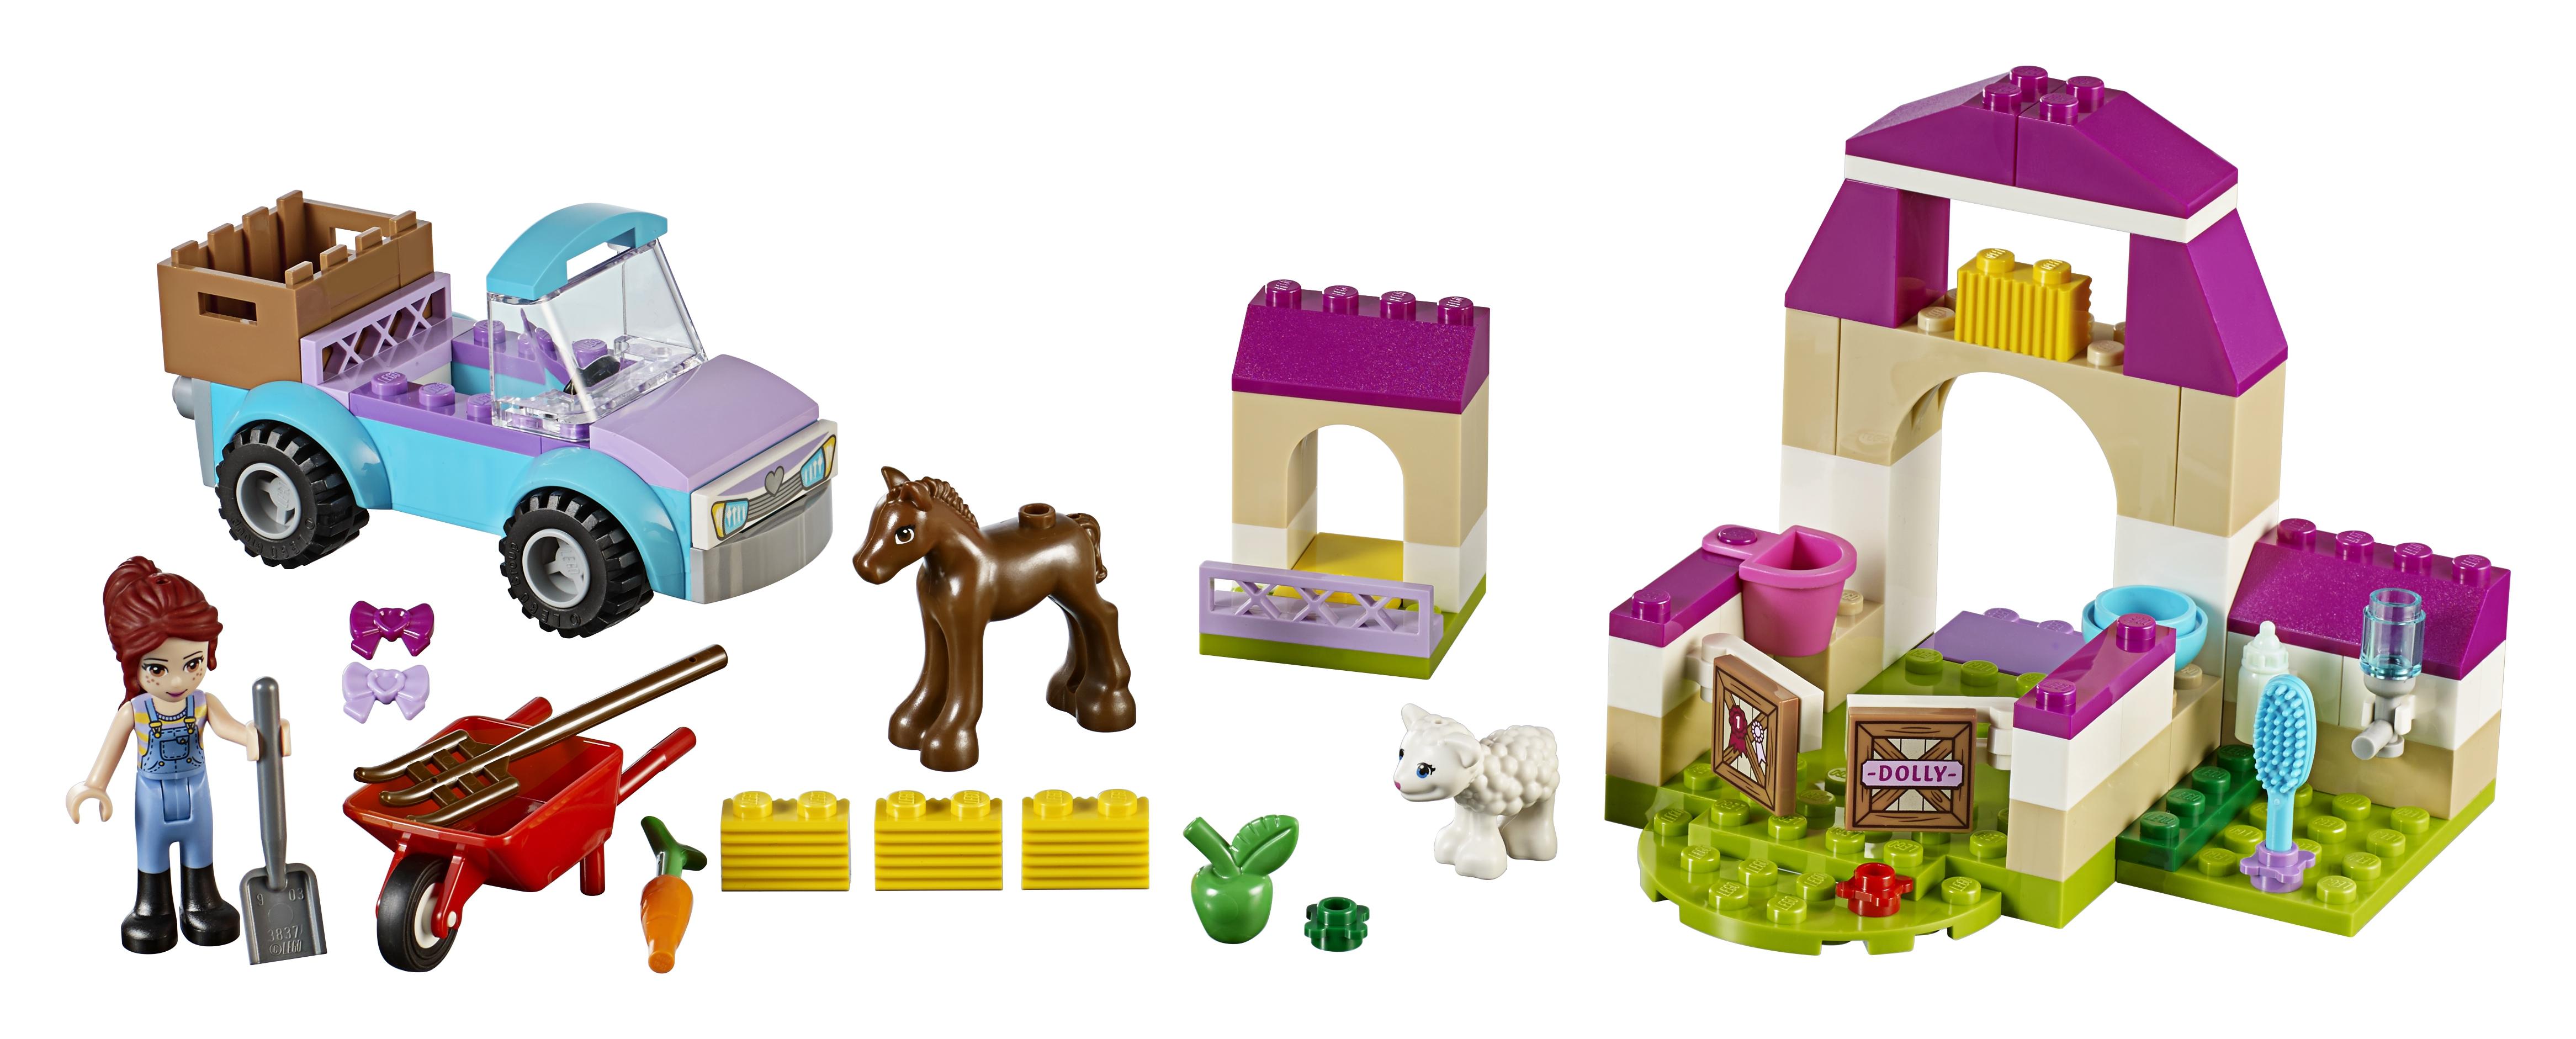 LEGO LEGO Juniors 10746 Чемоданчик «Ферма Мии» lego juniors 10733 лего джуниорс тачки свалка мэтра